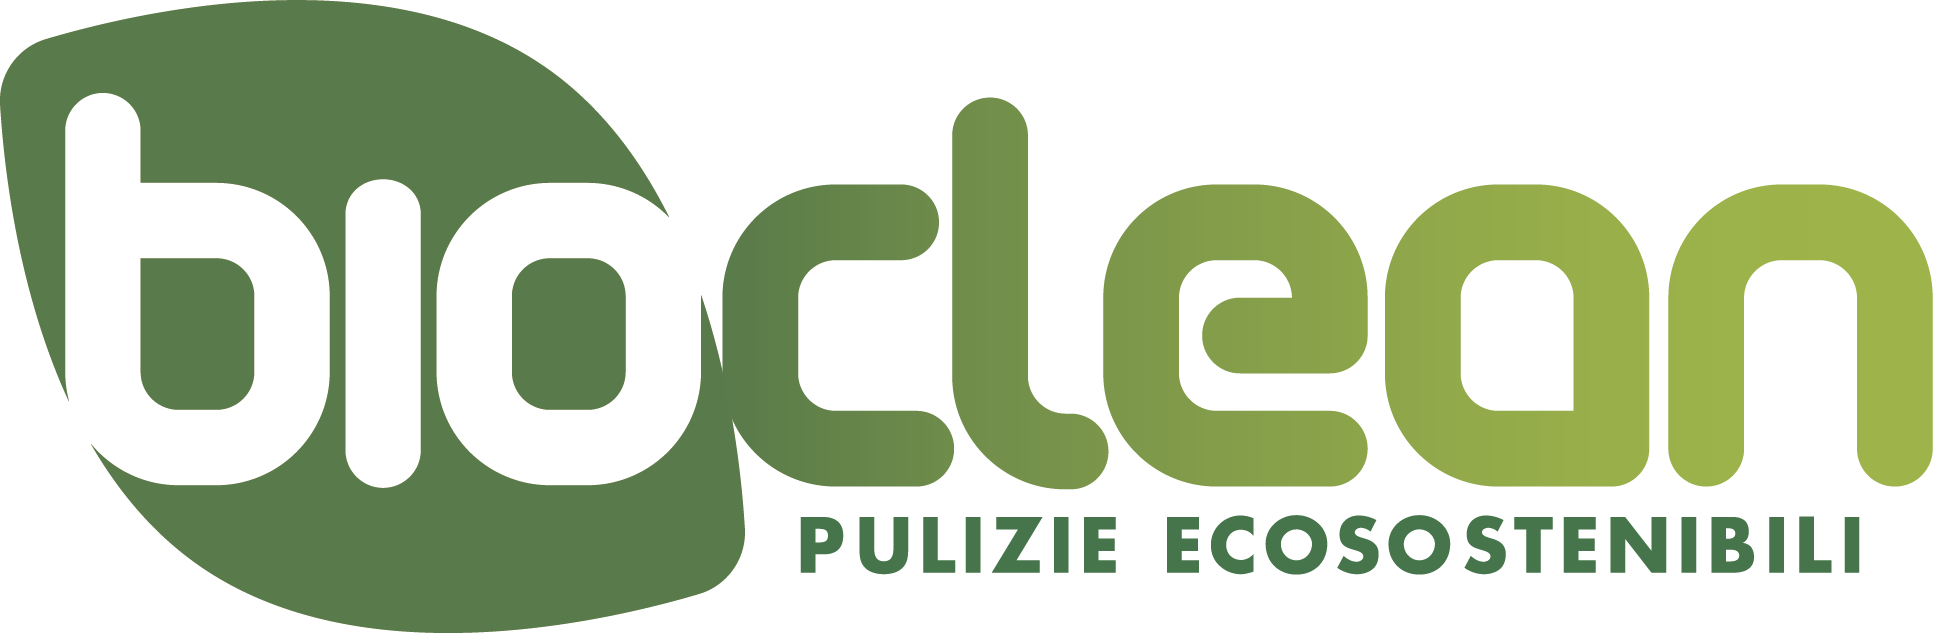 Bioclean Milano impresa pulizie ecosostenibili